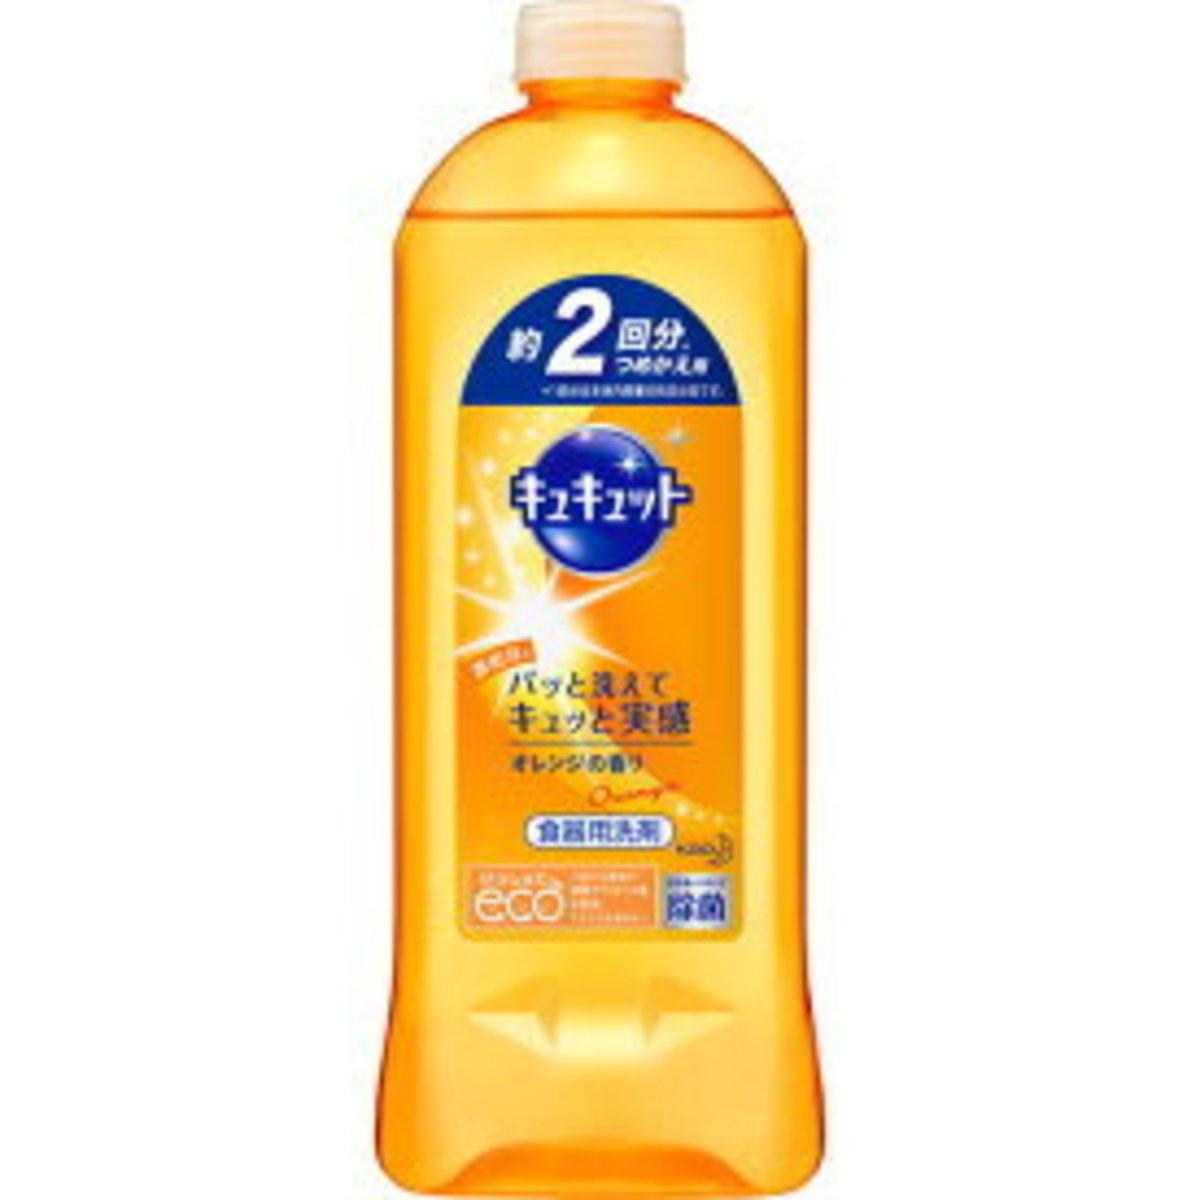 Cucute super-concentrated detergent sterilization (orange fragrance) 385ml supplement village